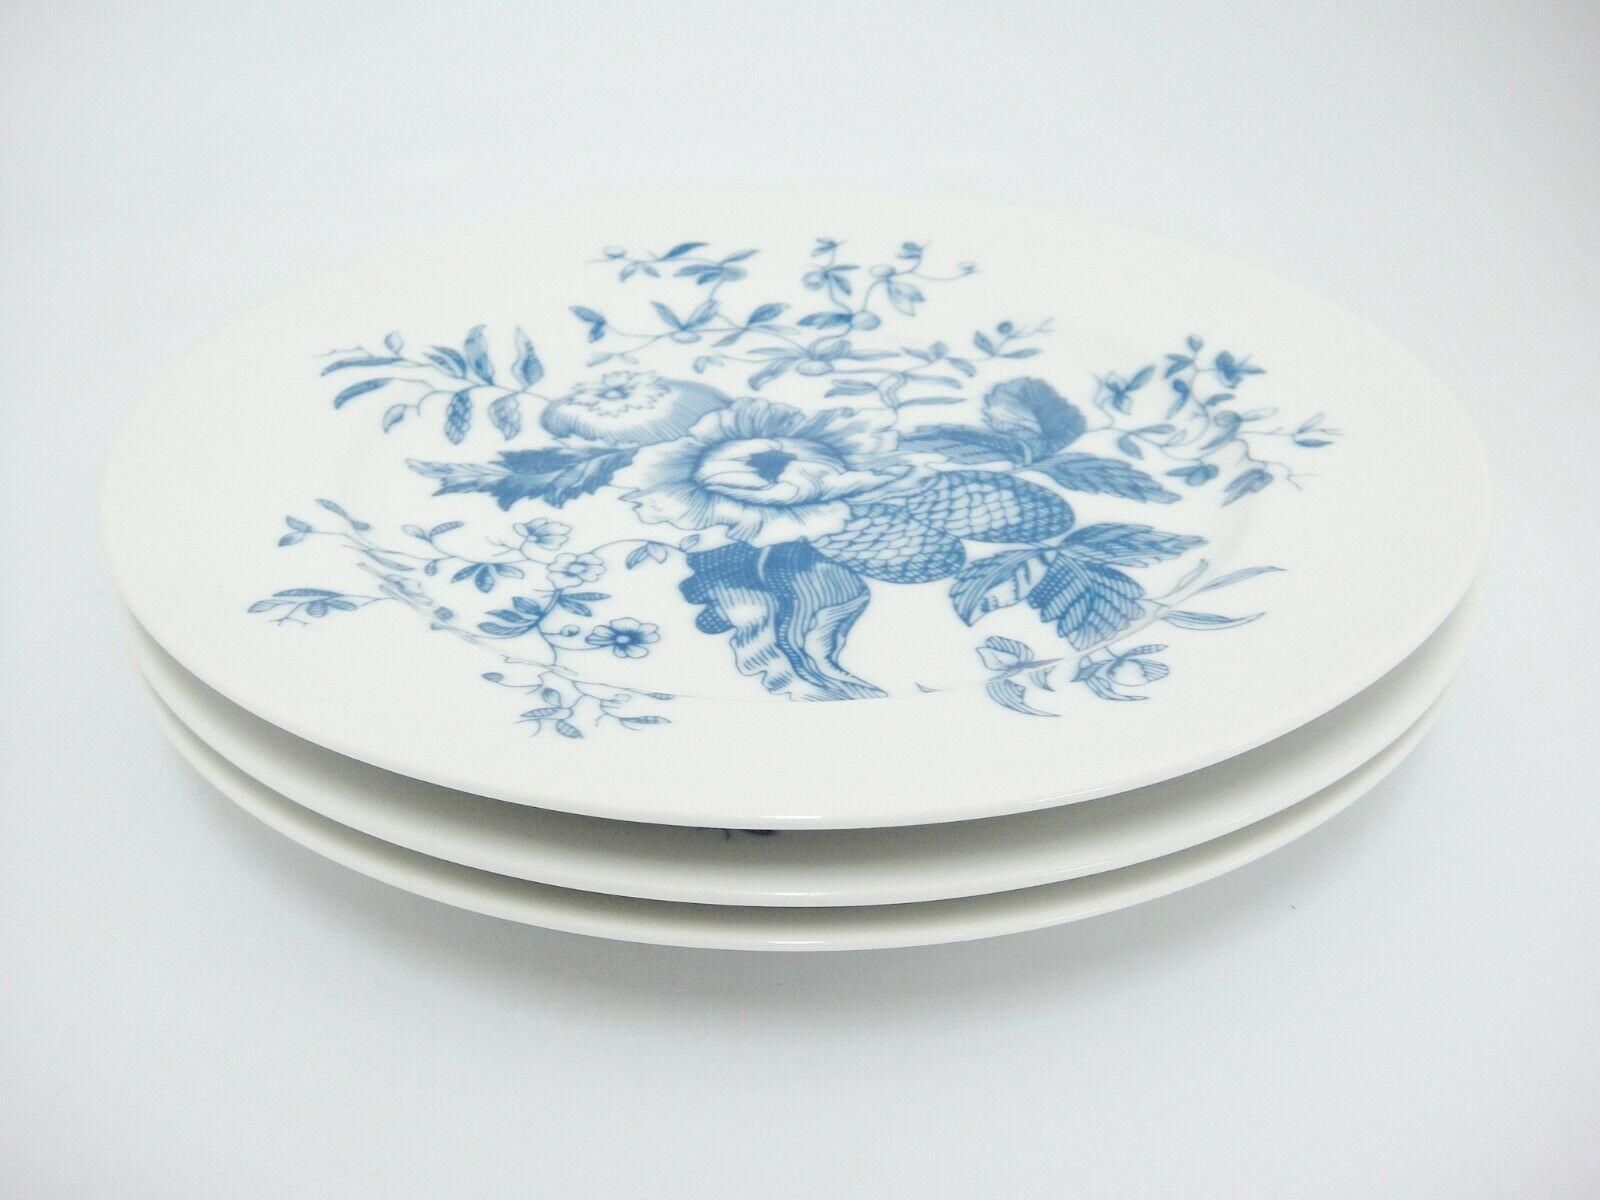 Royal Worcester Rhapsody Salad Plates Lot of 3 Blue Floral England Excellent